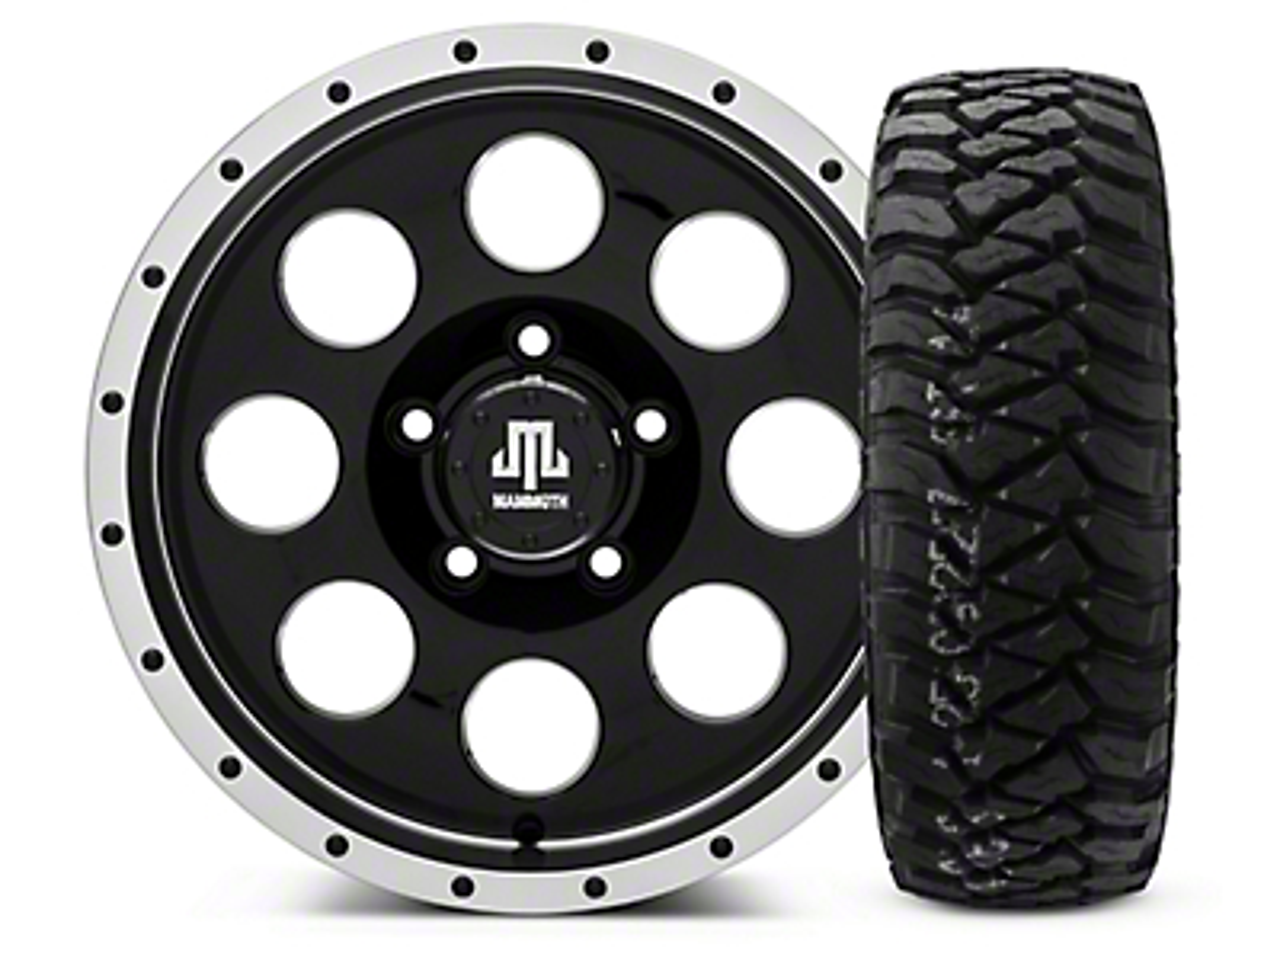 Mammoth 8 Beadlock Style Black - 16x8 Wheel - and Mickey Thompson Baja MTZP3 Tire - 285/75R16 (07-18 Jeep Wrangler JK; 2018 Jeep Wrangler JL)